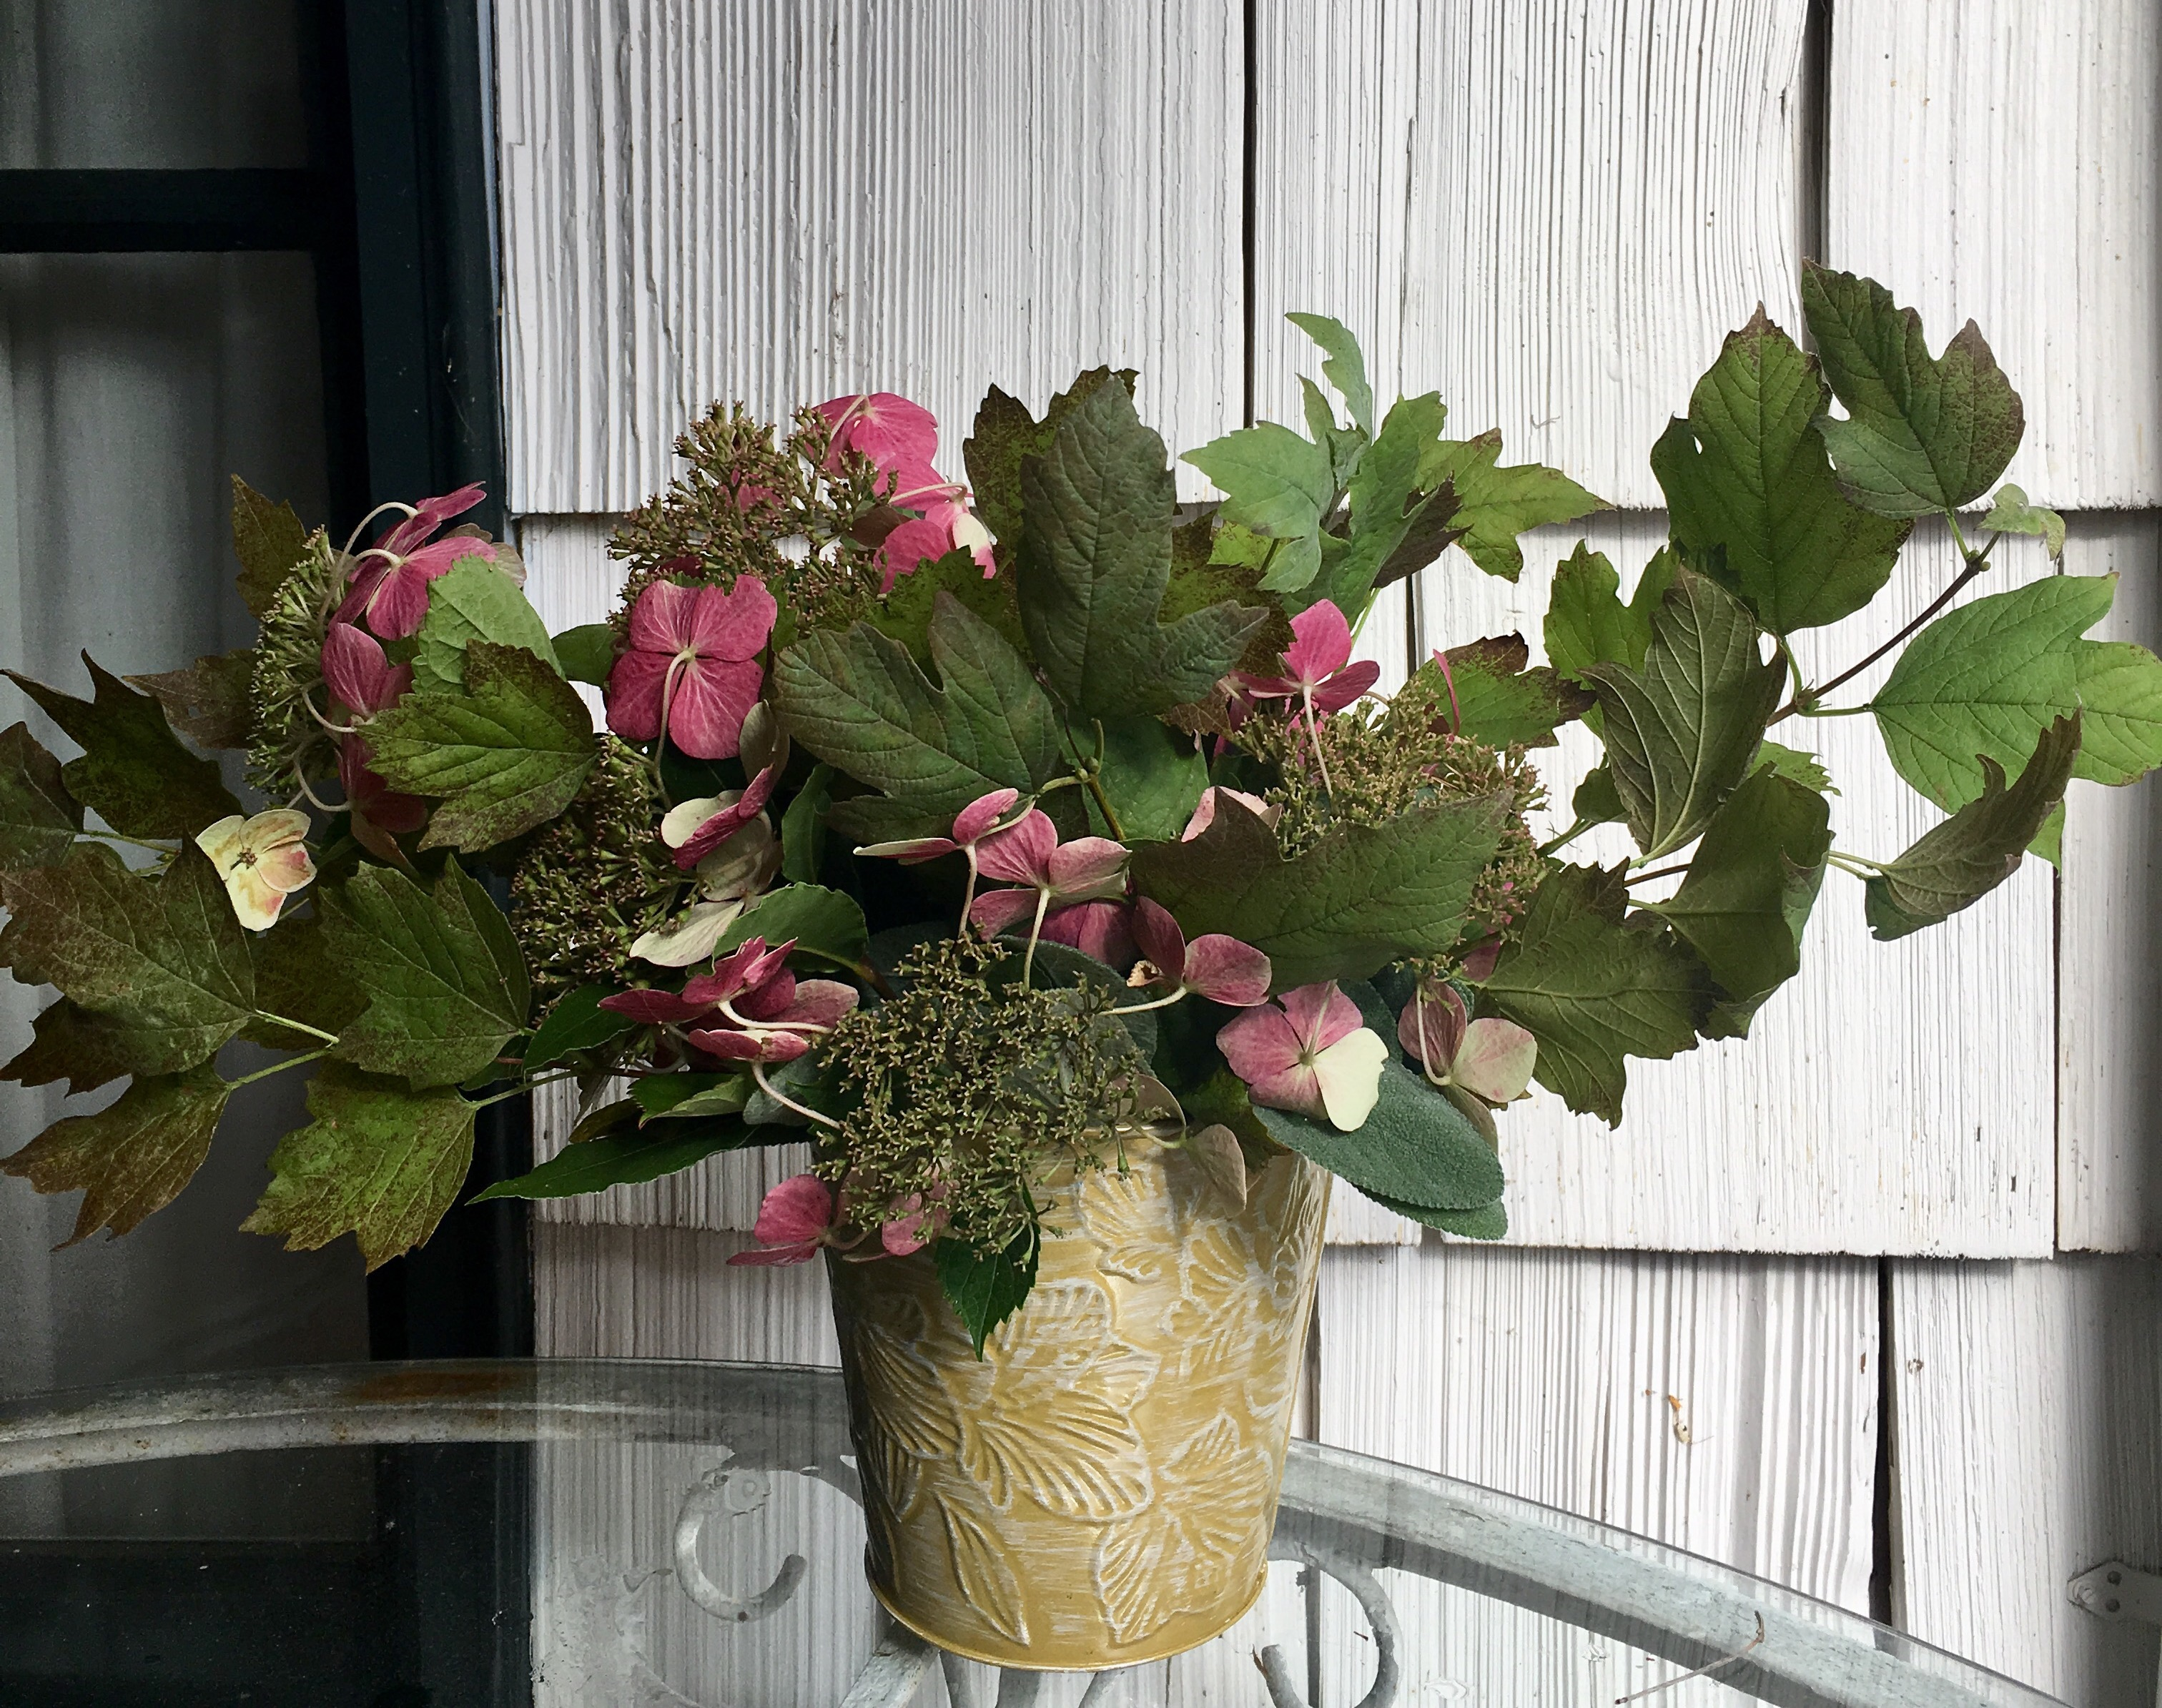 Fall bouquet, step 2: adding flowers, lace cap Hydrangeas